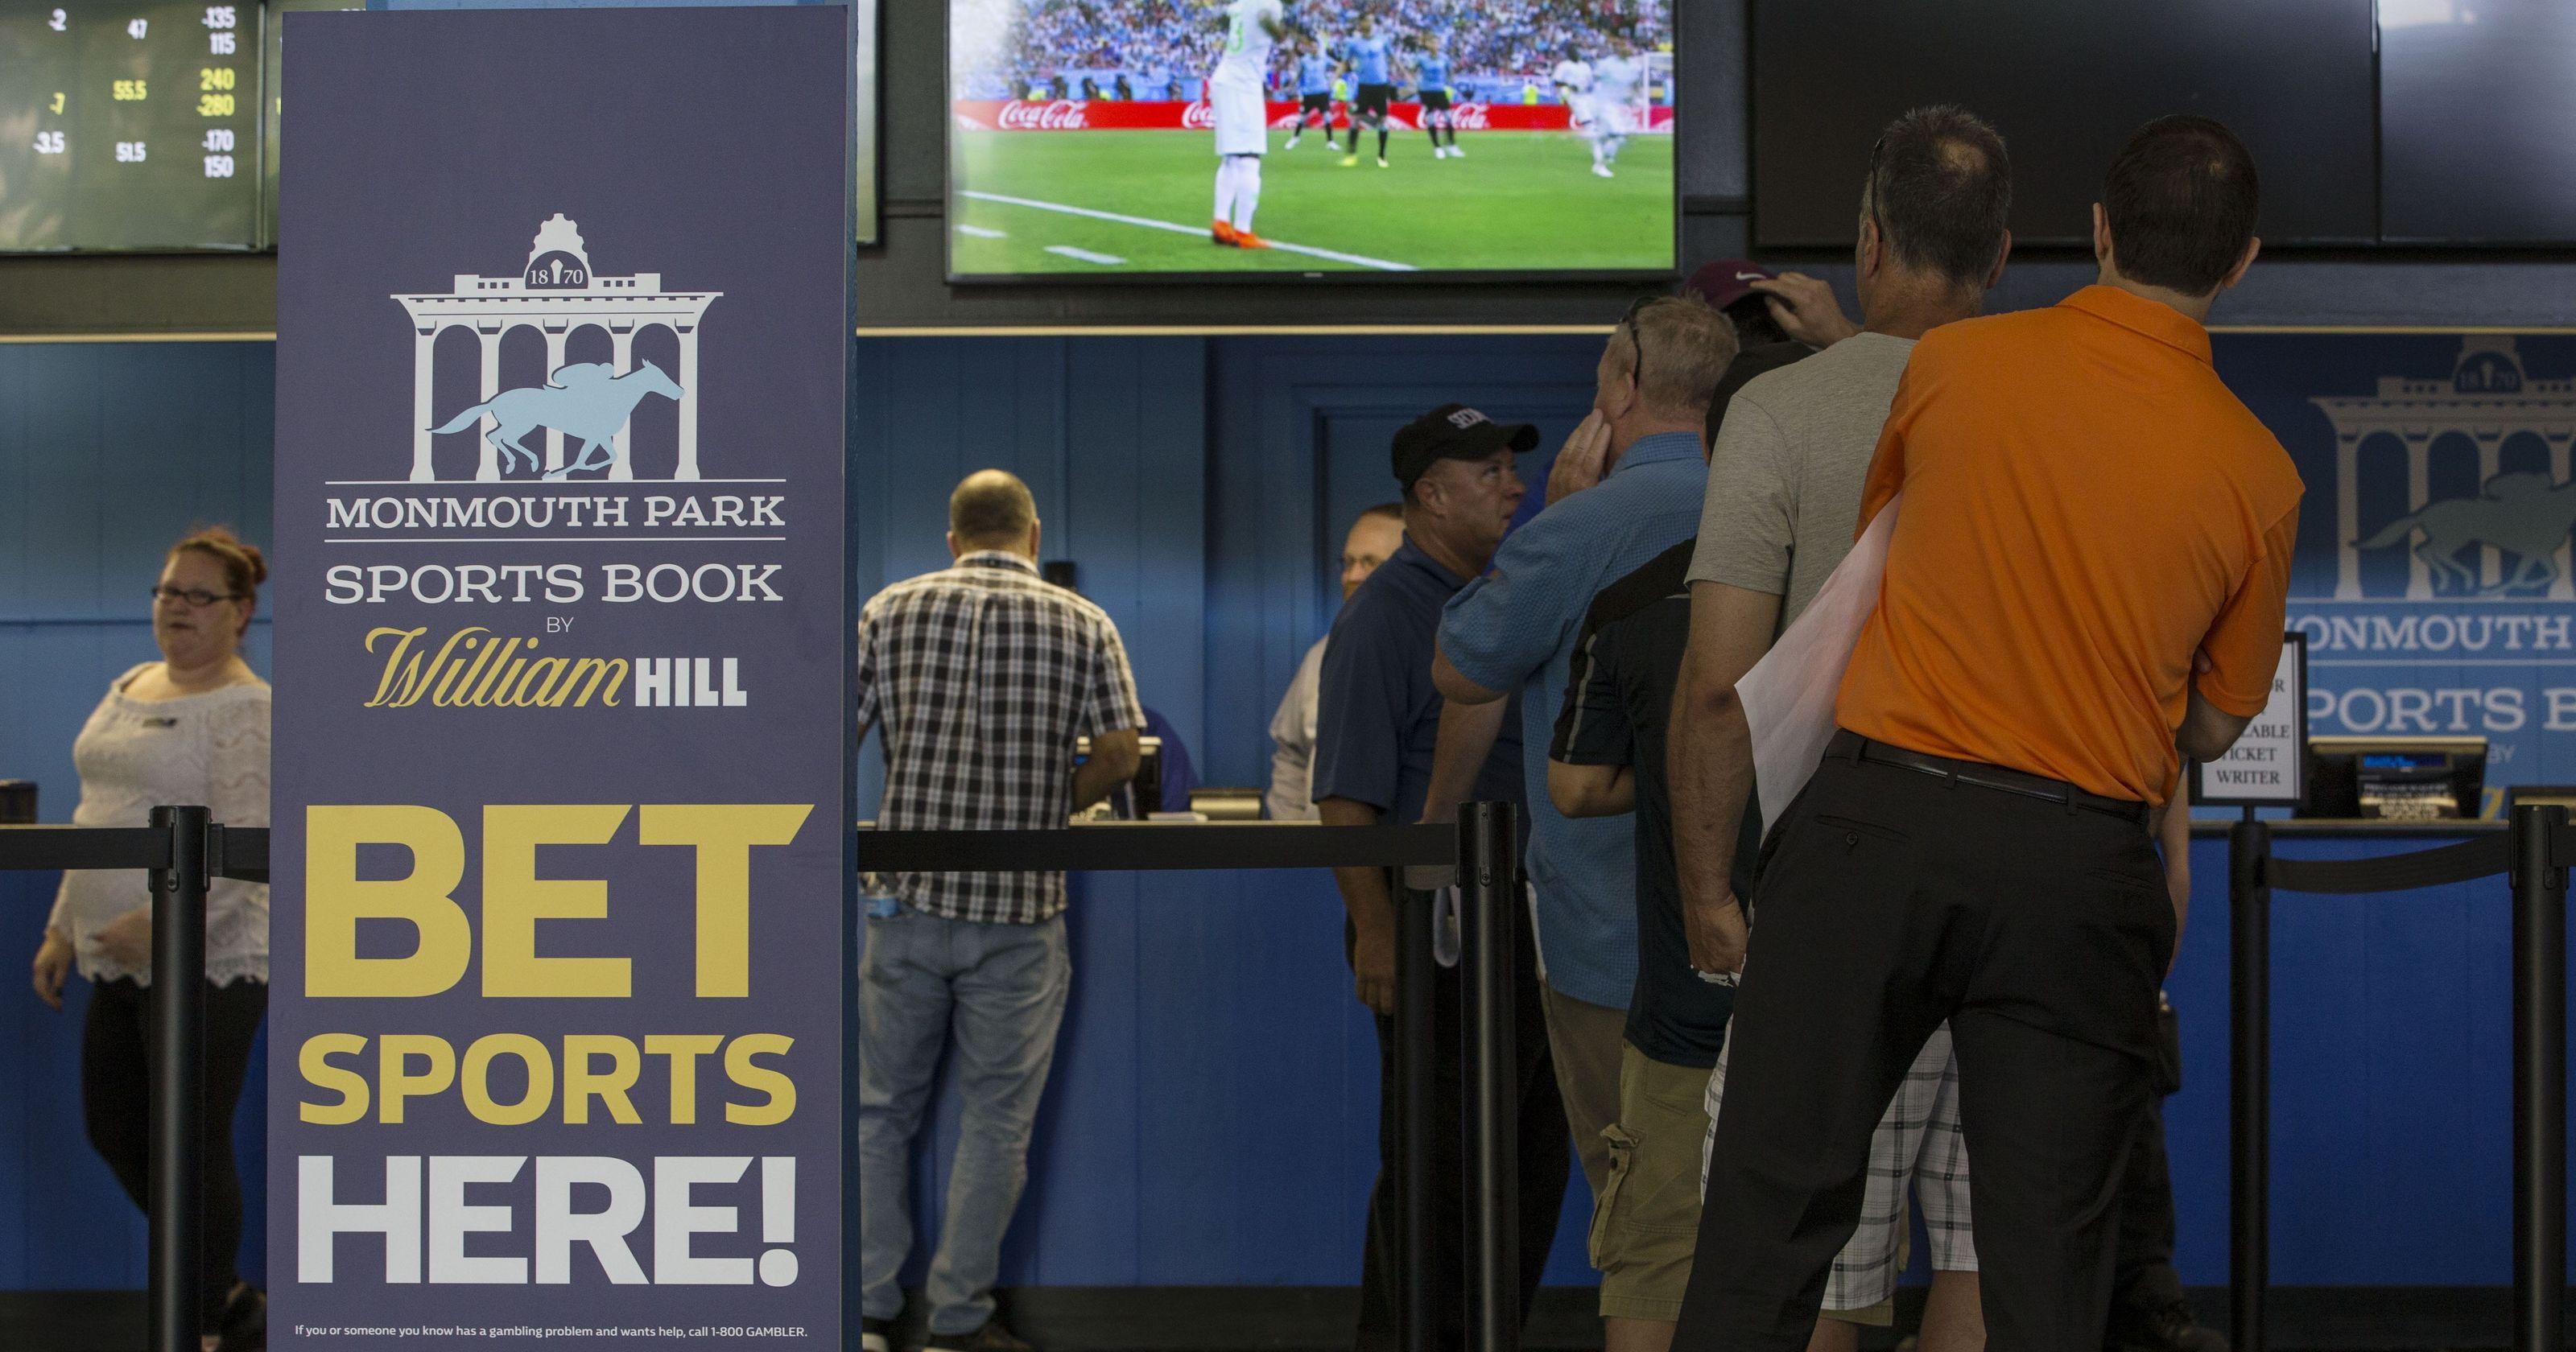 William hill sports betting usa las vegas sports betting app